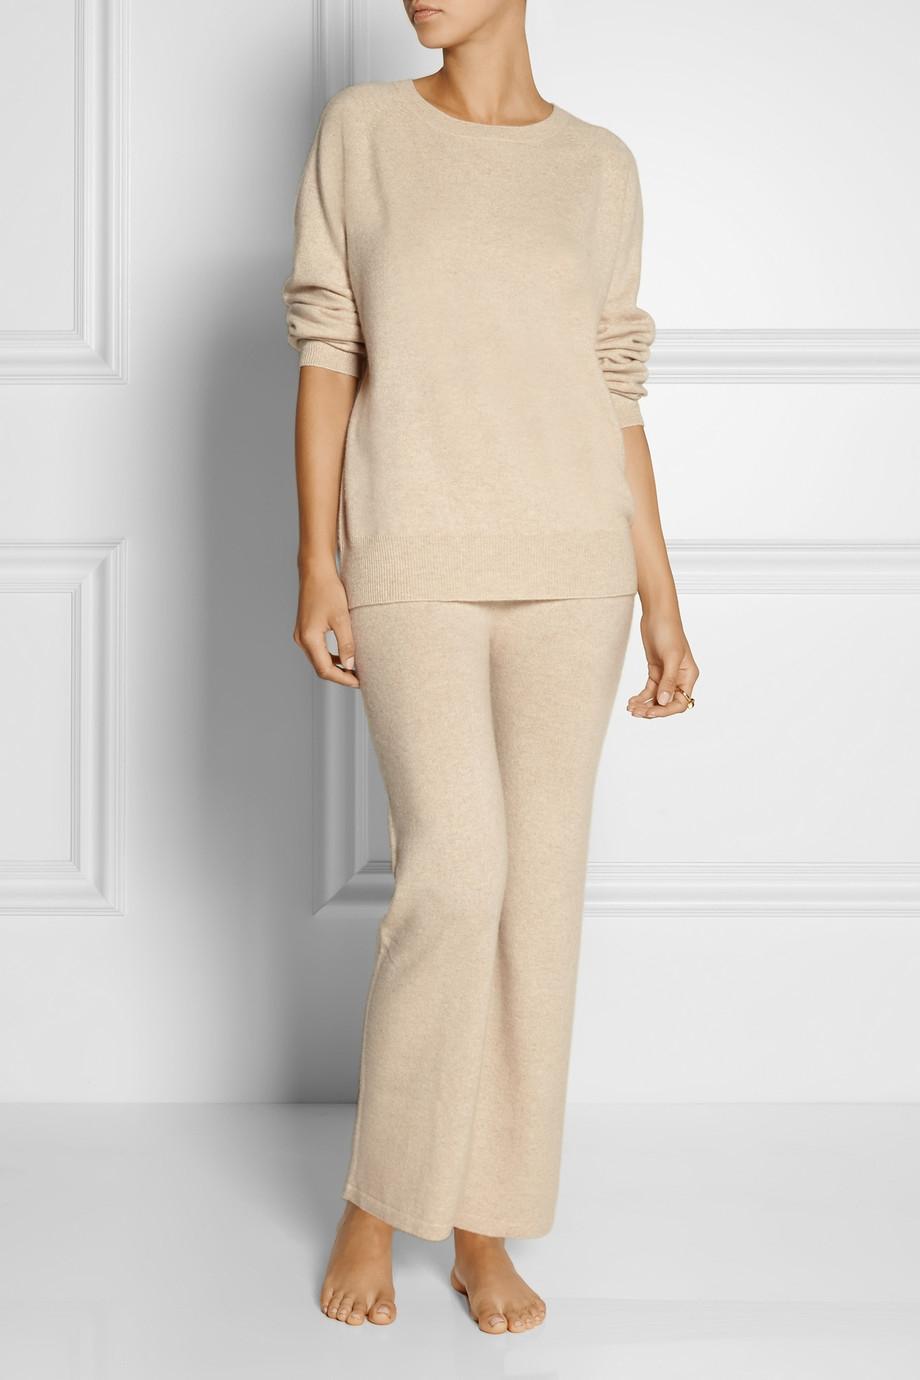 Madeleine Thompson Martha Cashmere Pajama Set In White - Lyst-6510